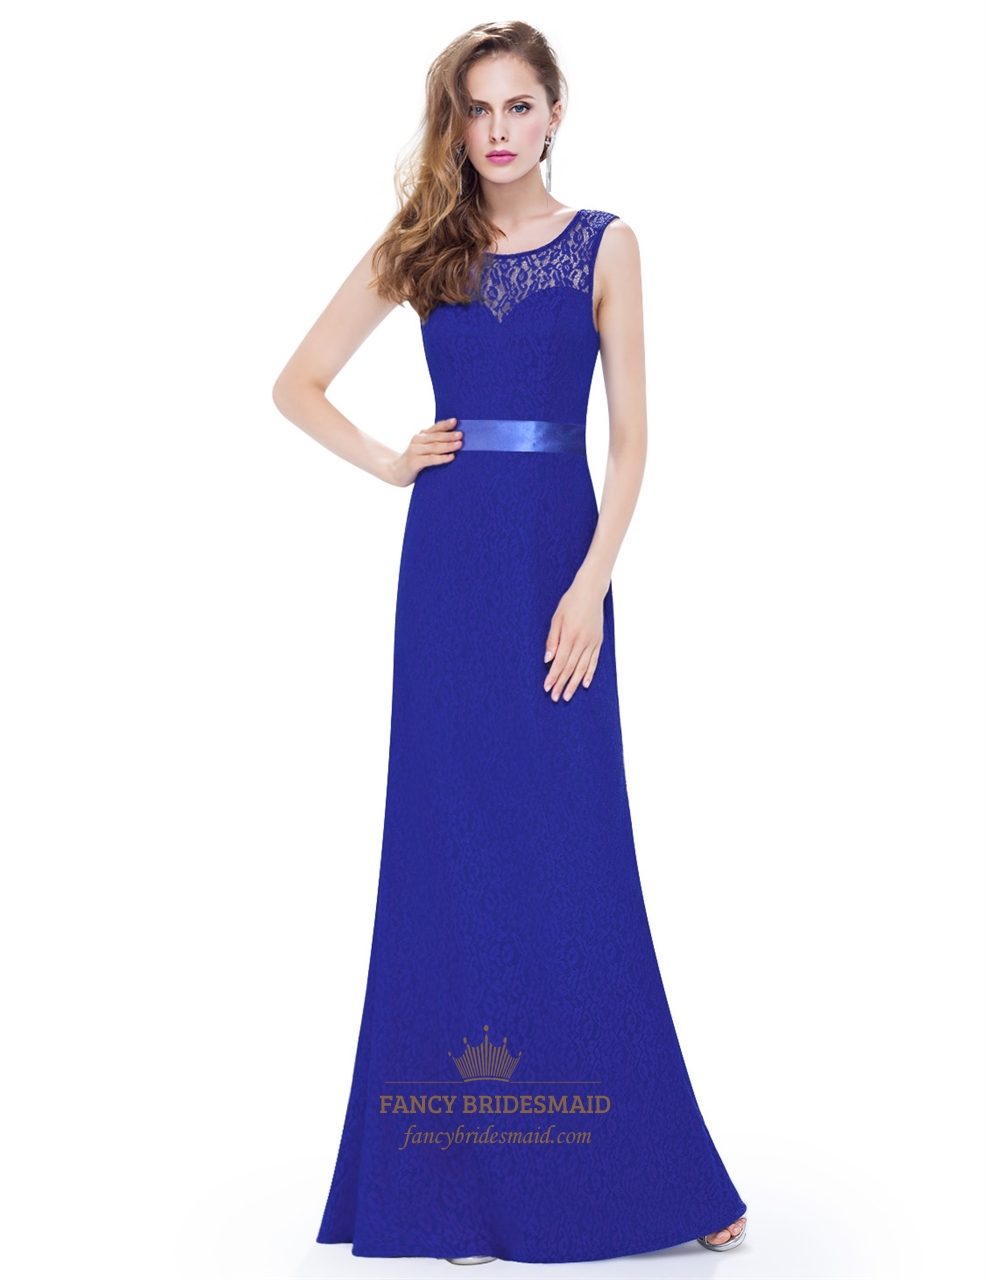 Royal blue lace open back long bridesmaid dress with satin ribbon royal blue lace open back long bridesmaid dress with satin ribbon ombrellifo Images